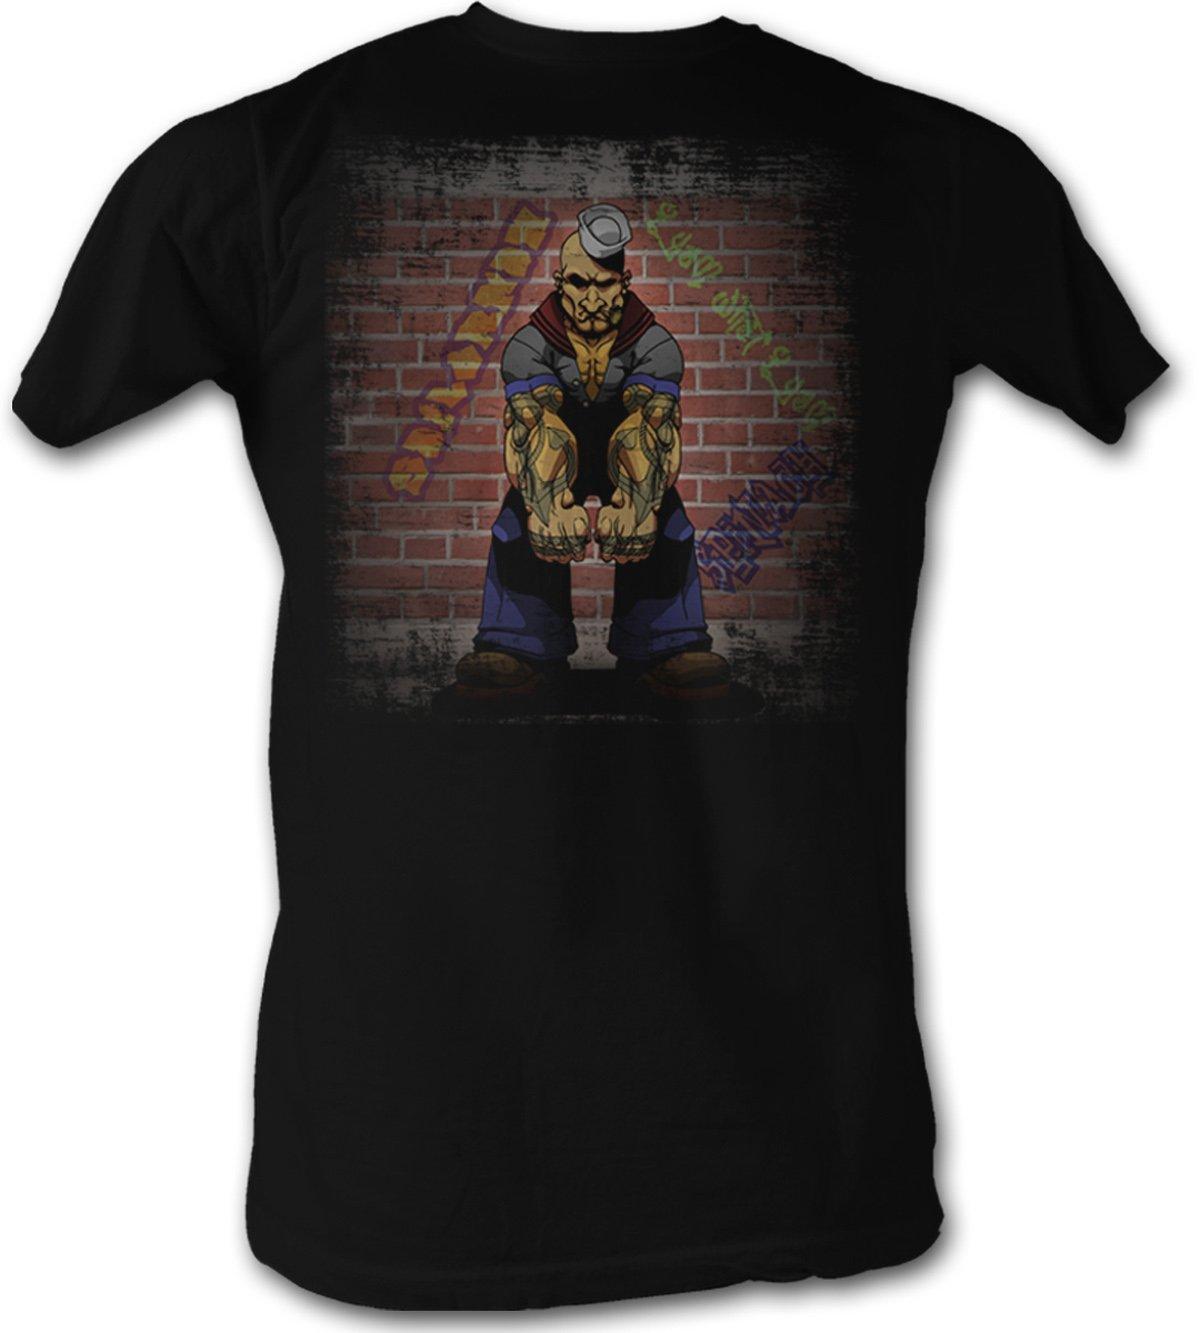 A E Designs Popeye T Shirt Serious Popeye The Sailorman Adult Black T